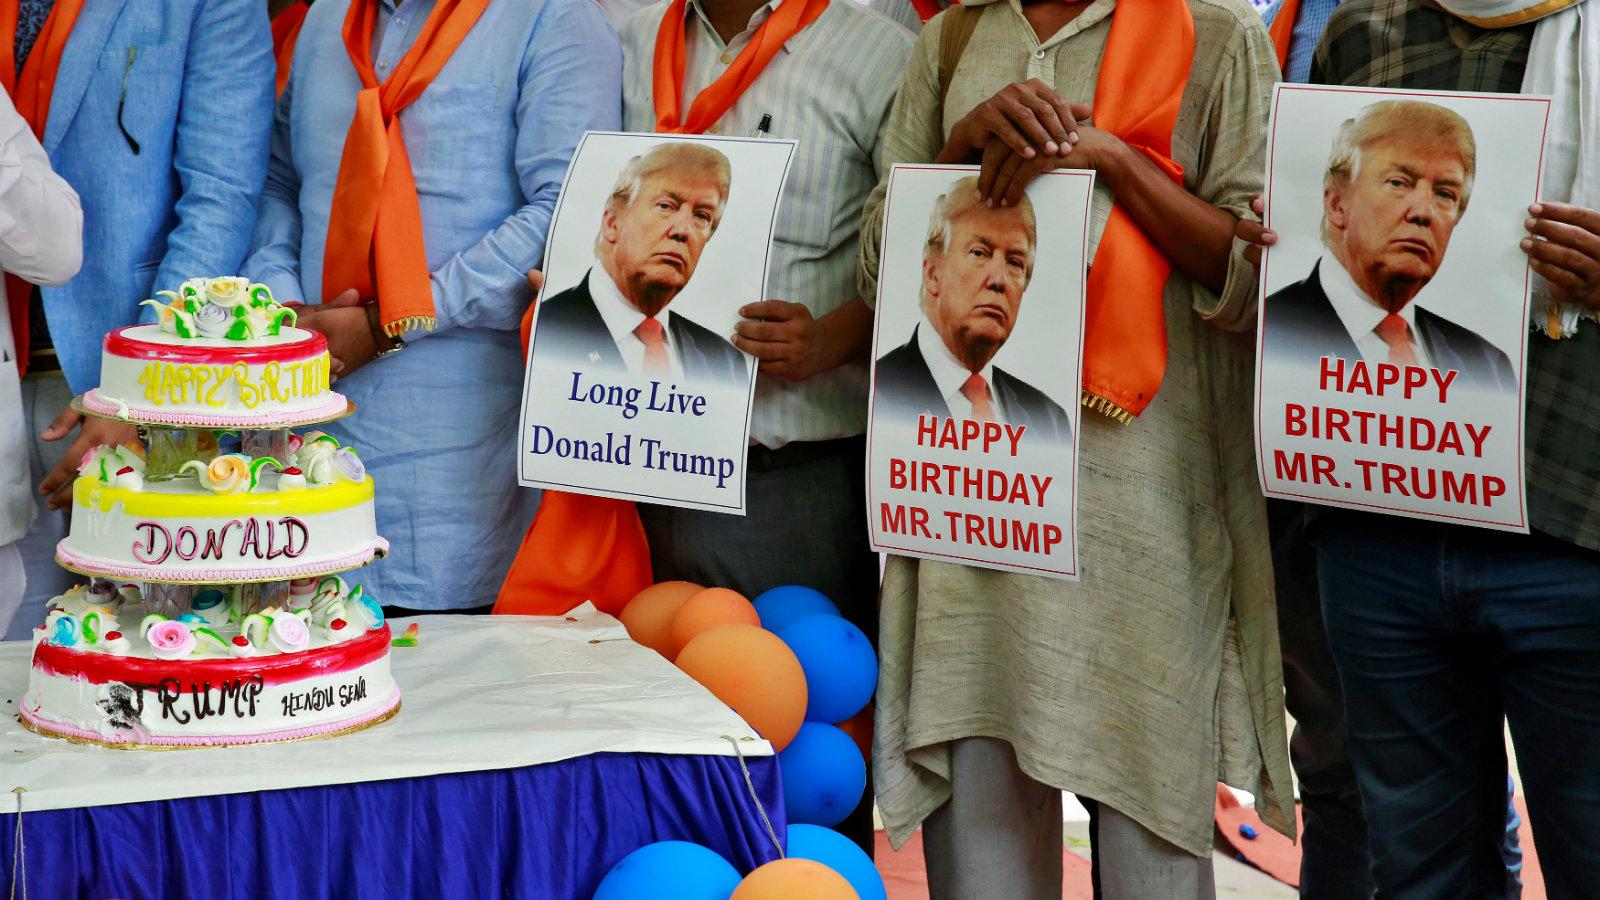 Members of Hindu Sena, a right wing Hindu group, celebrate  Donald Trump's birthday in New Delhi, India in June 2016.